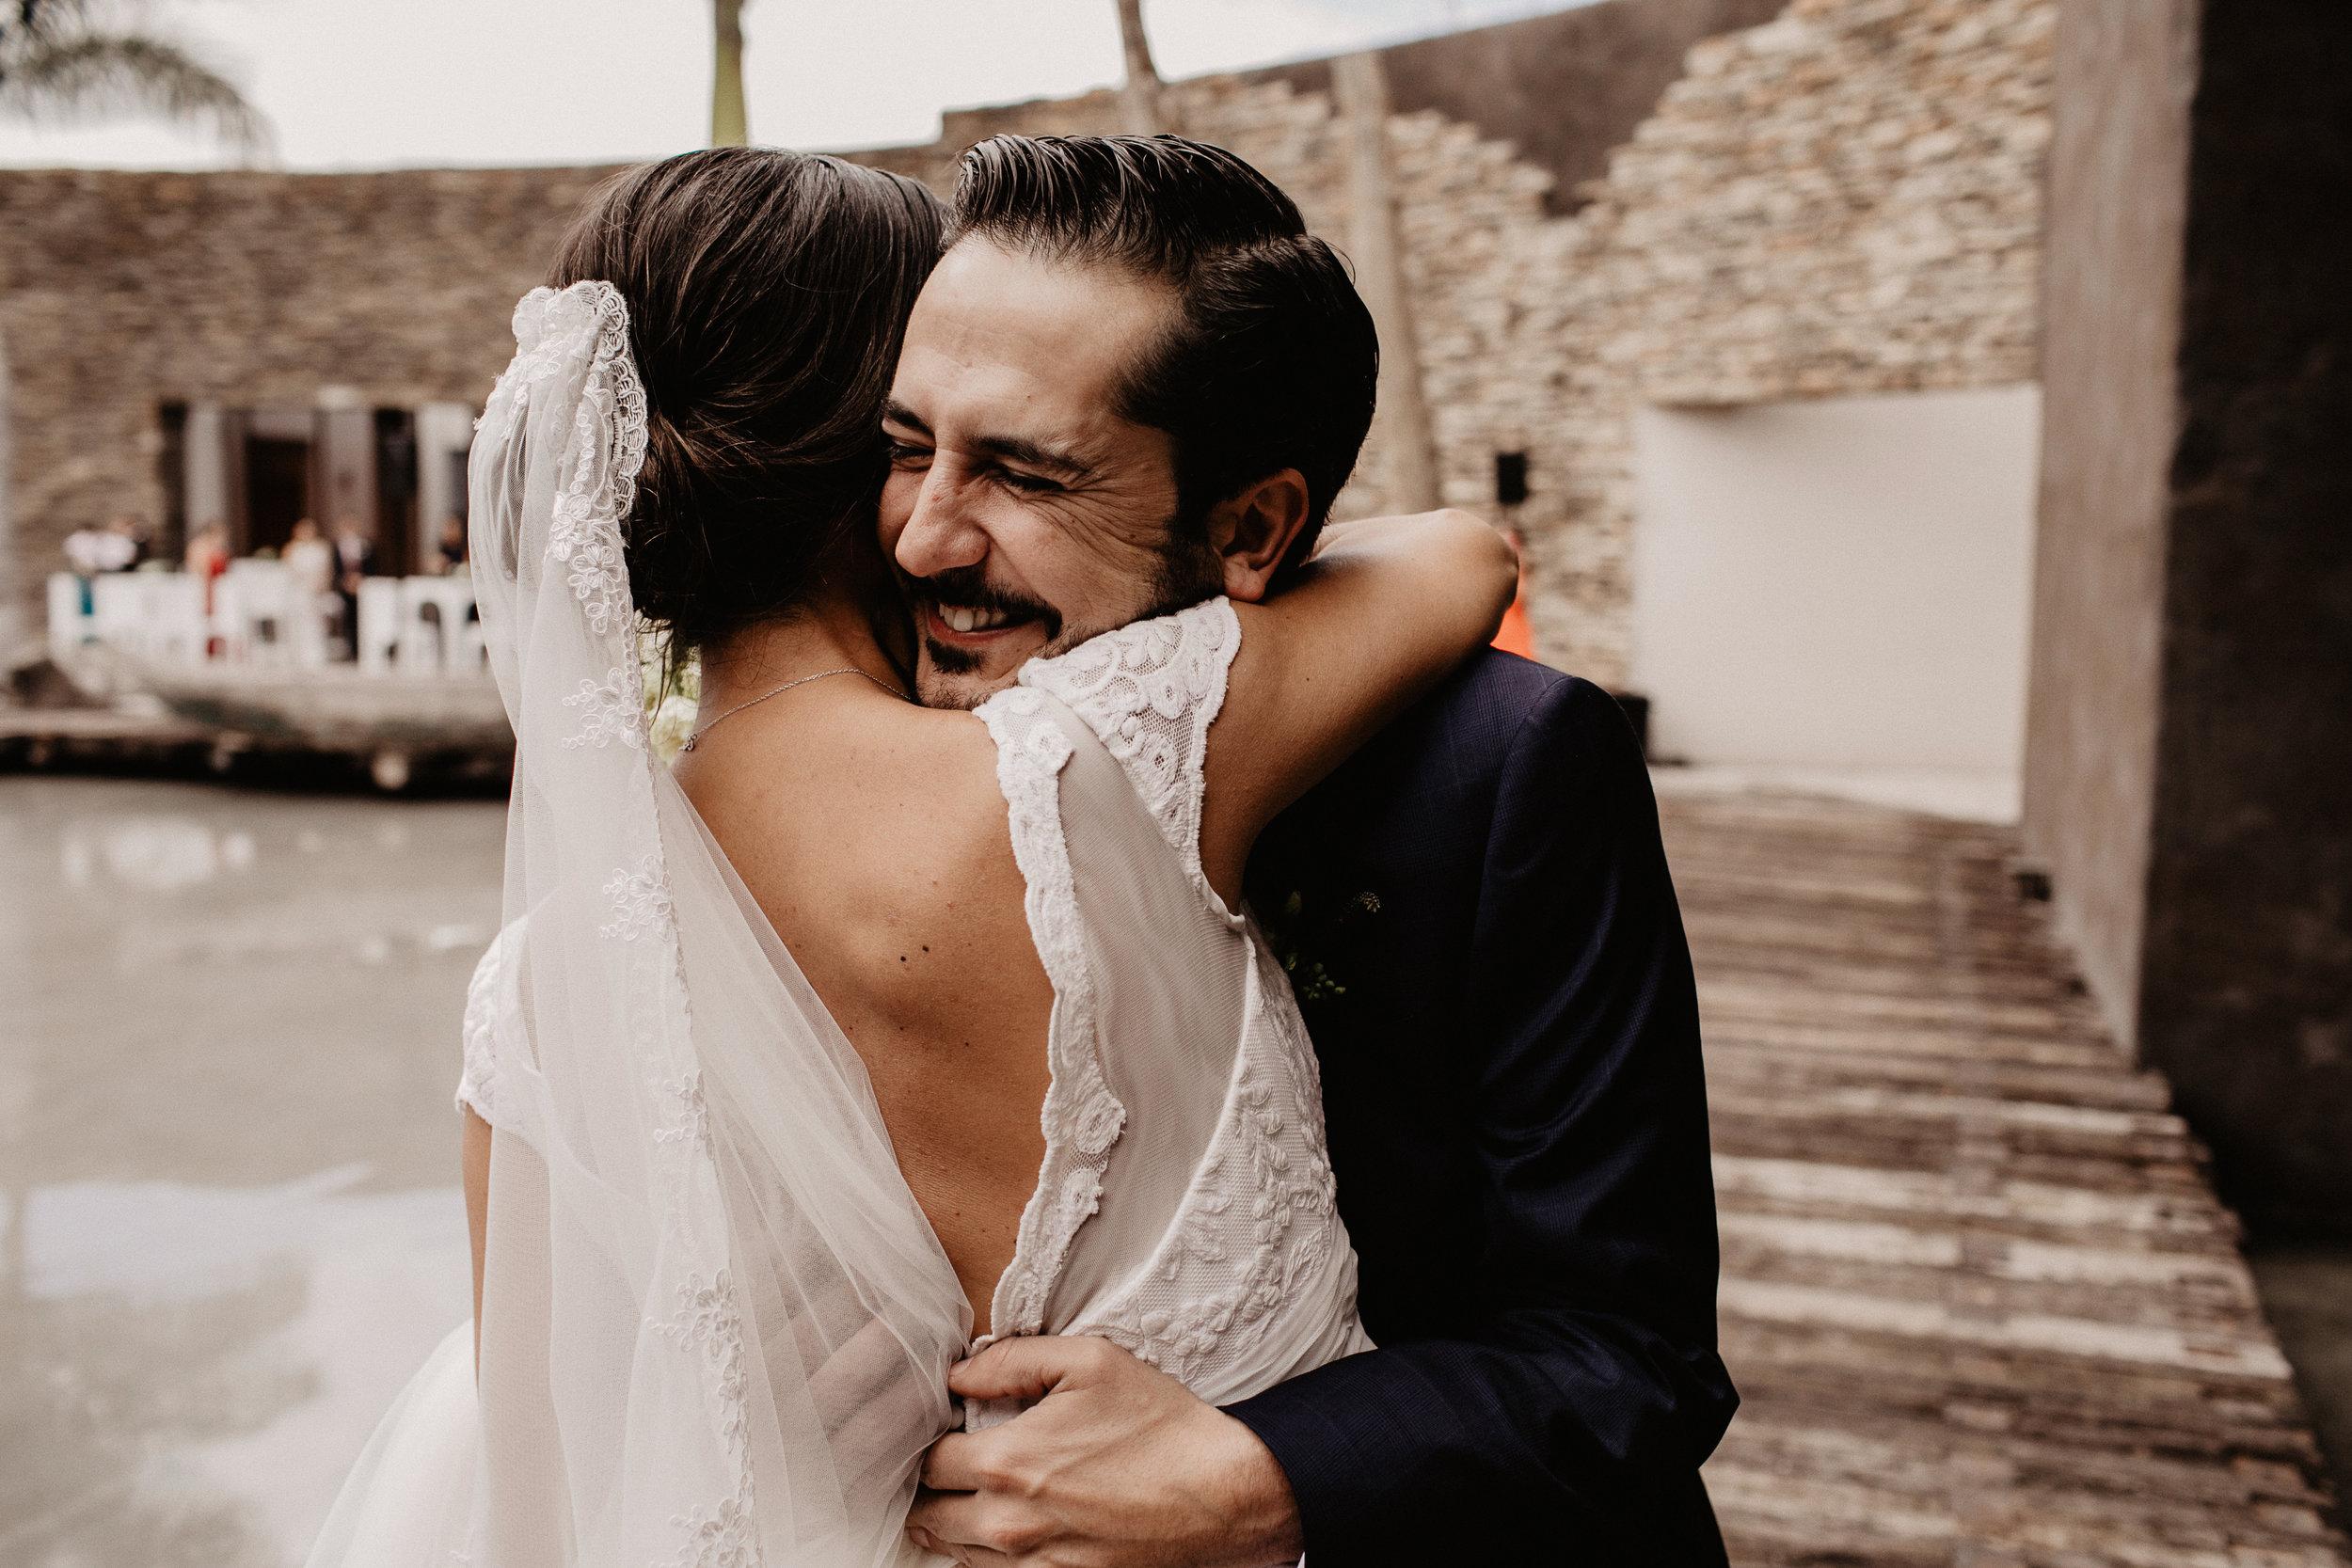 alfonso_flores_destination_wedding_photographer_pau_alonso_238.JPG